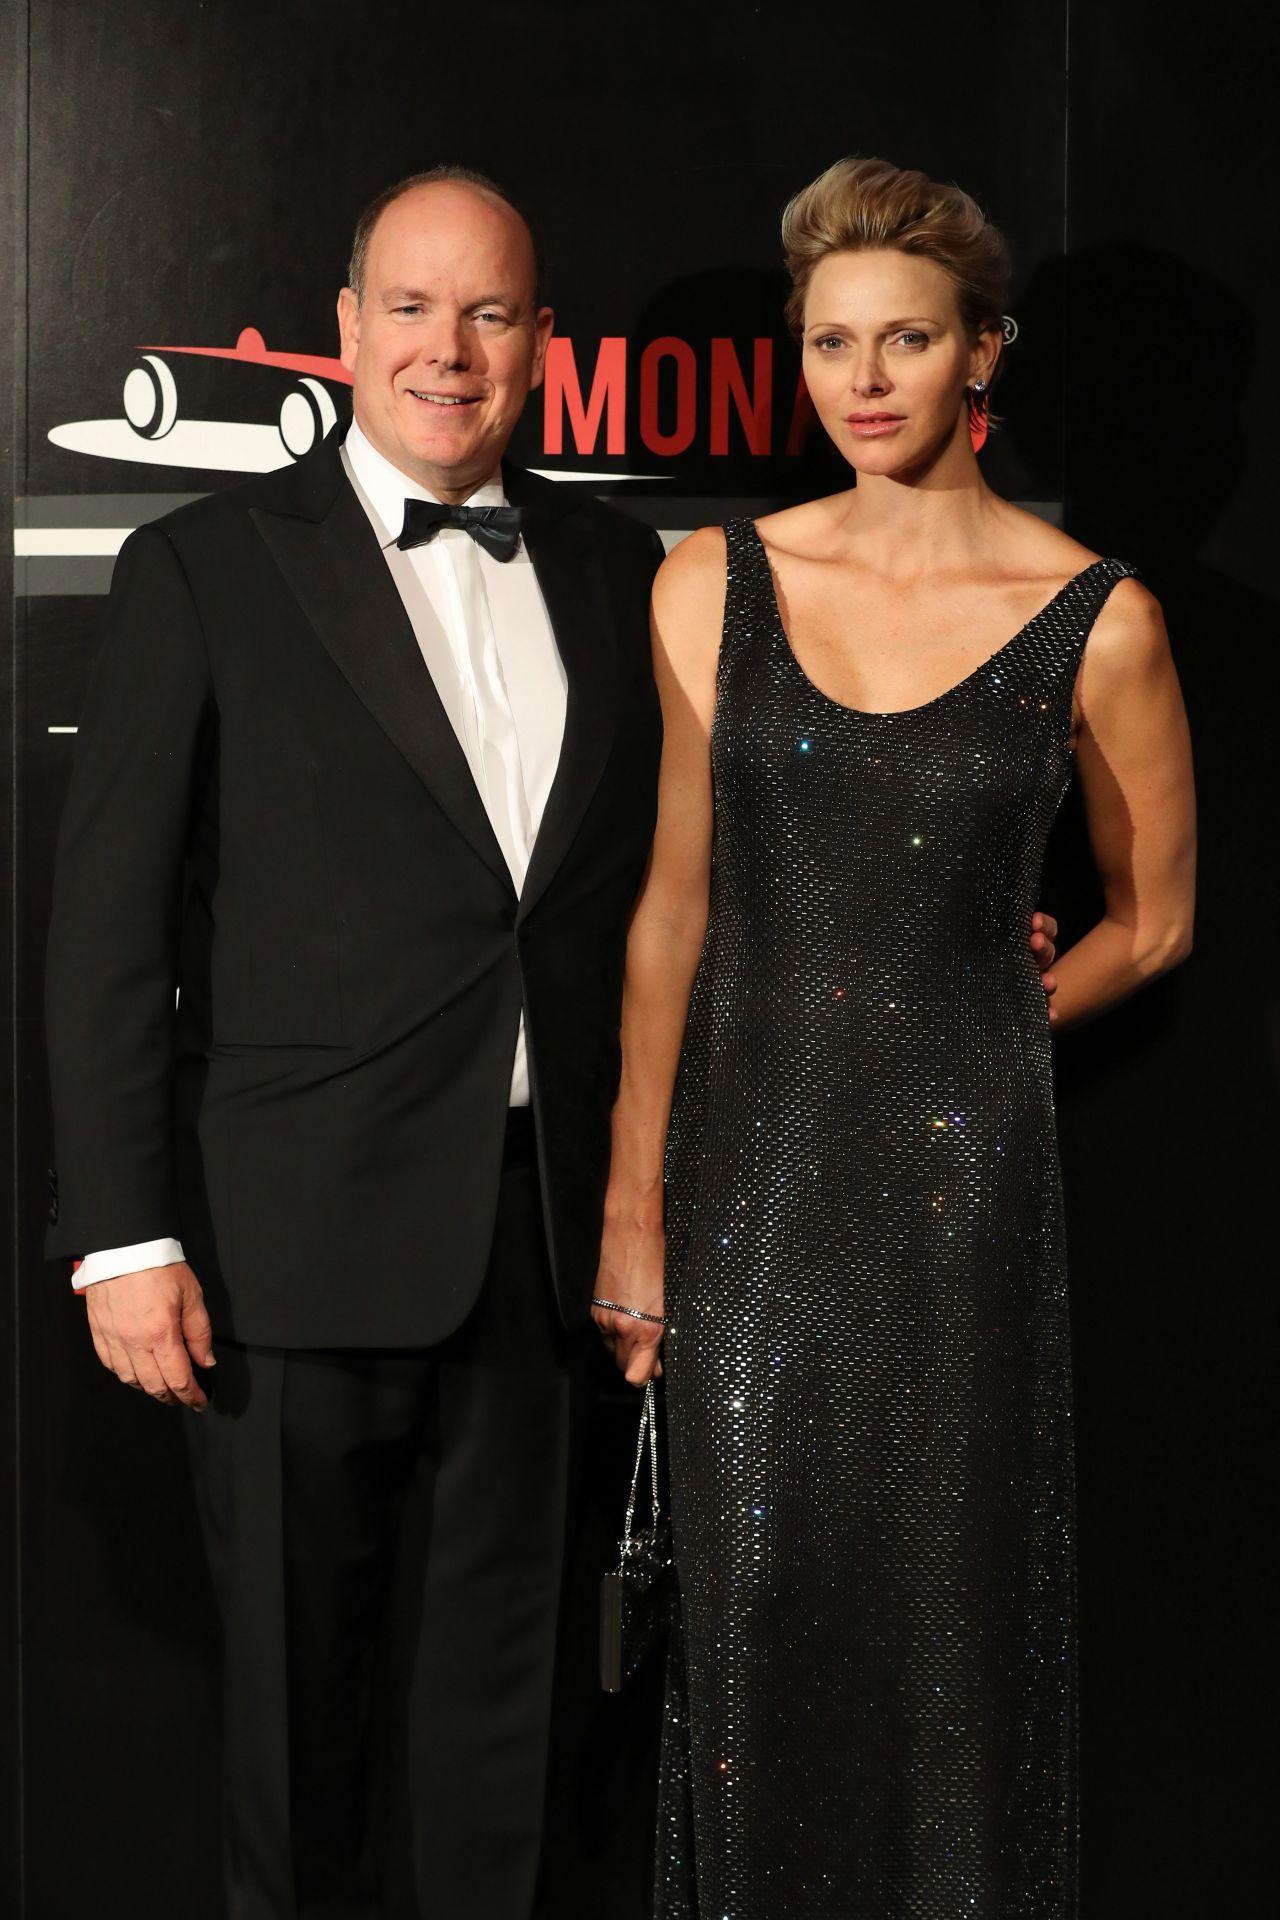 Grand Prix Las Vegas >> Princess Charlene of Monaco - ACM Dinner Gala, F1 Grand Prix of Monaco 05/27/2018